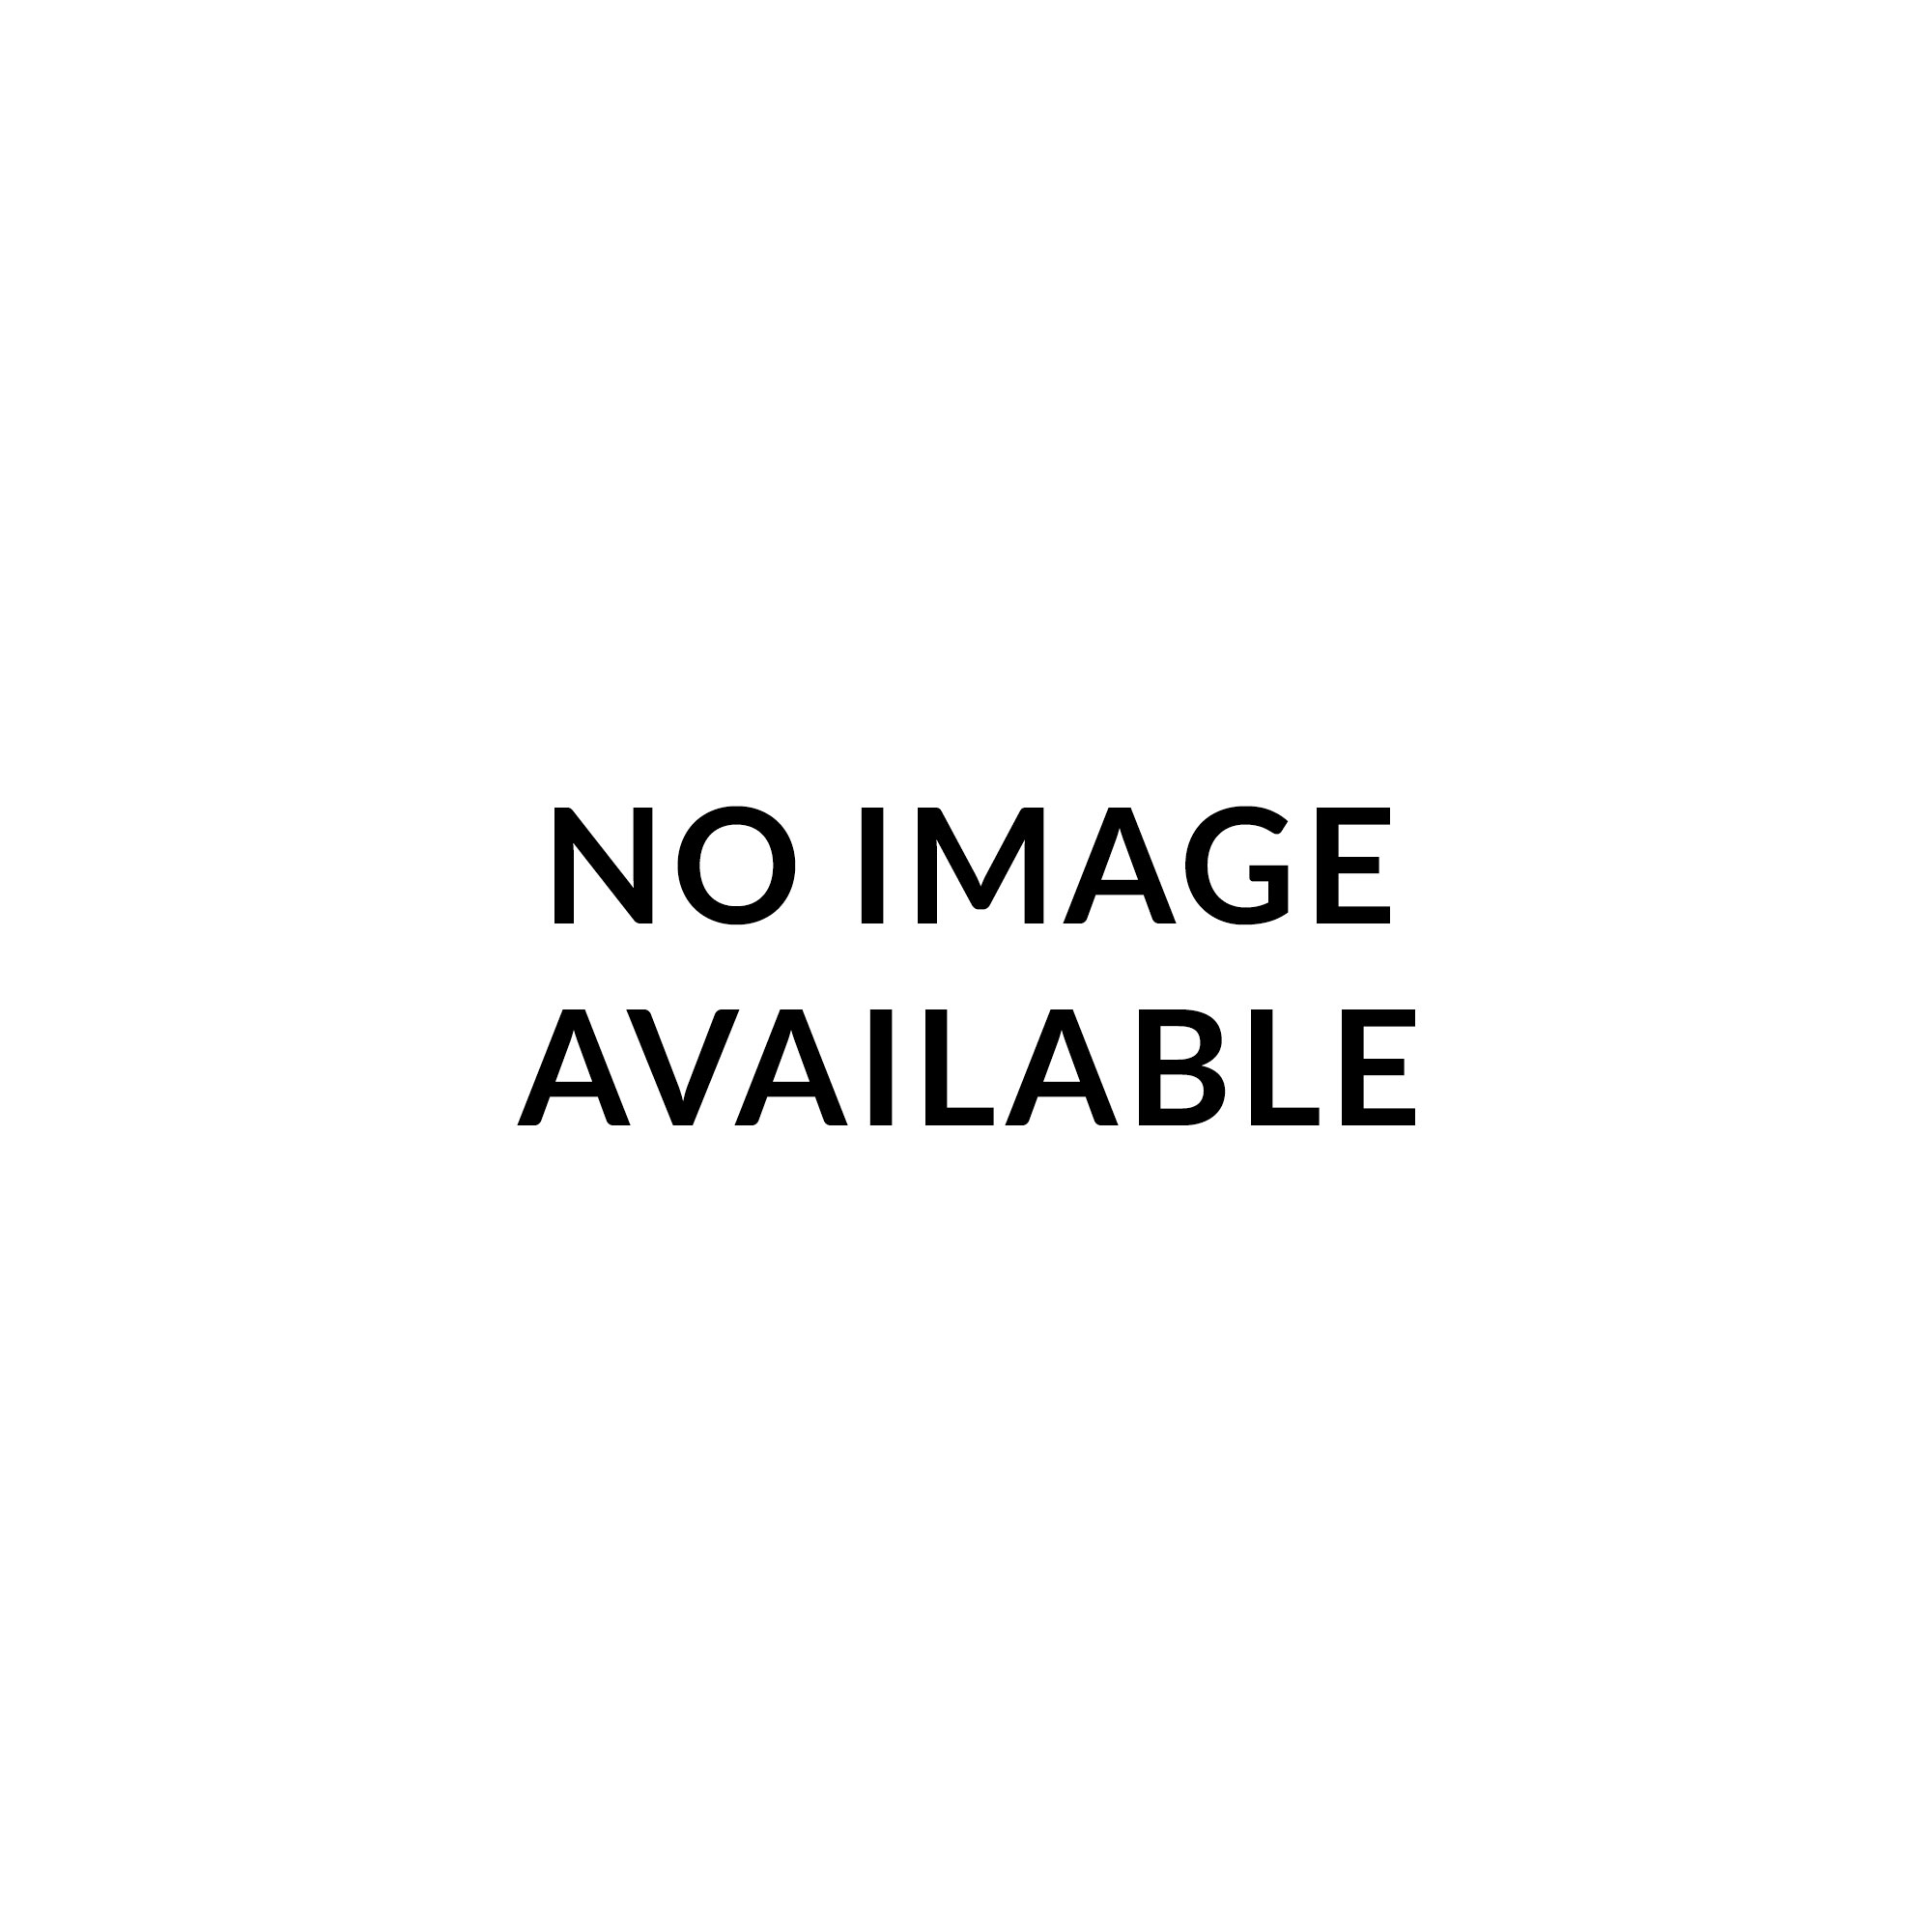 Newtone 6-String Lap Steel Guitar Strings - High G/A 15-46